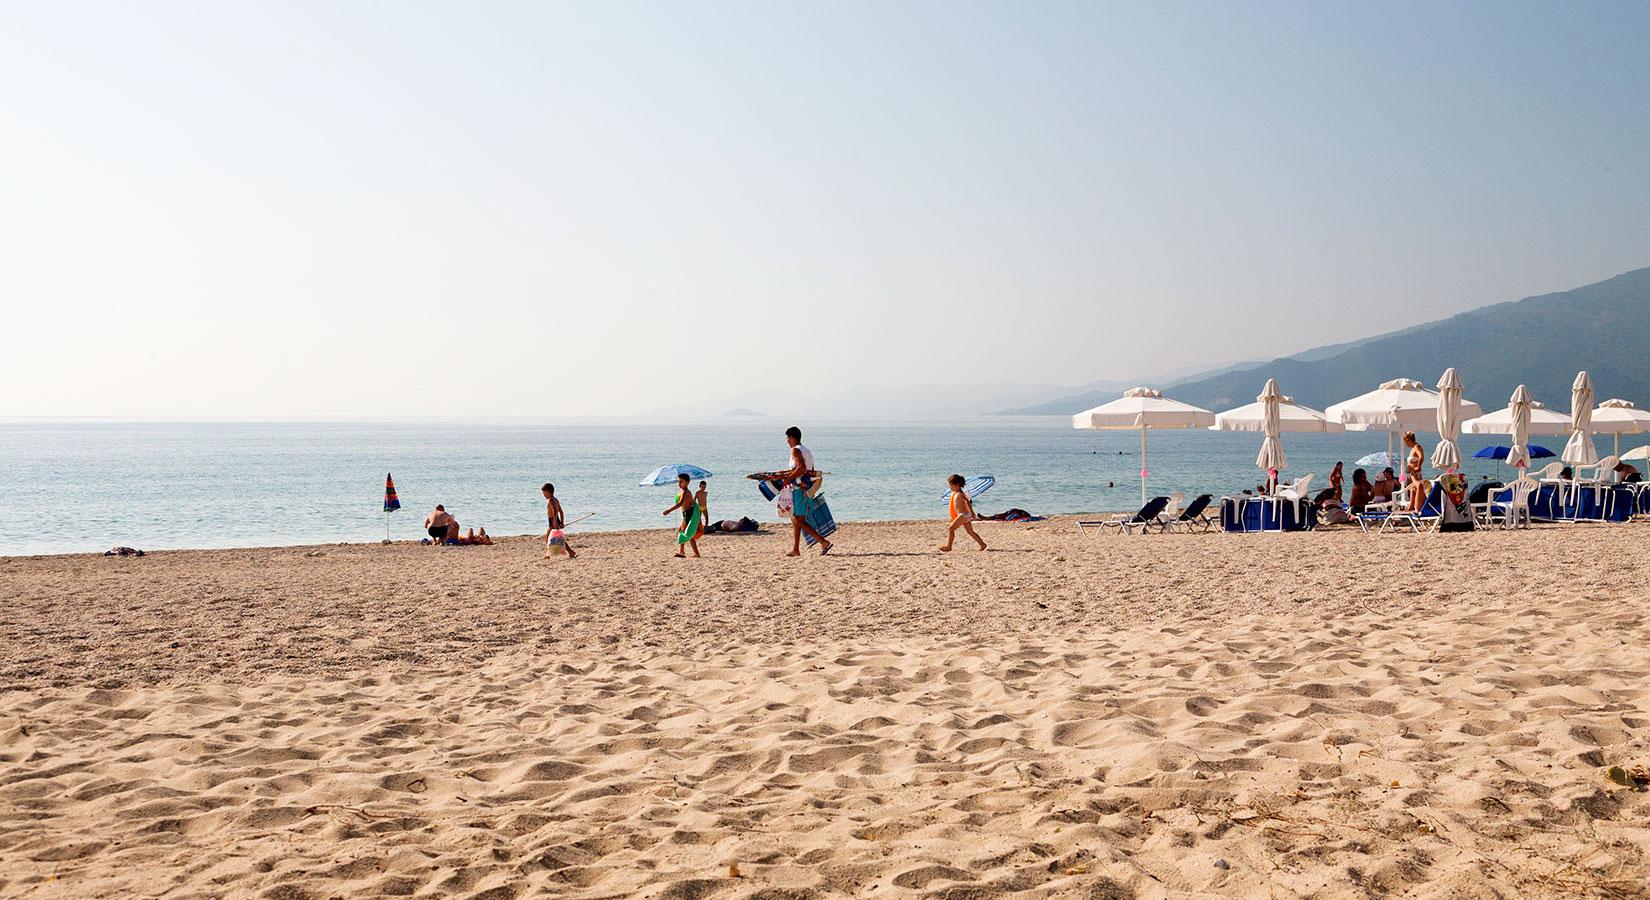 Asprovalta beach | Troia Resort studios to rent next to the sea coast of Asprovalta 1 of 20